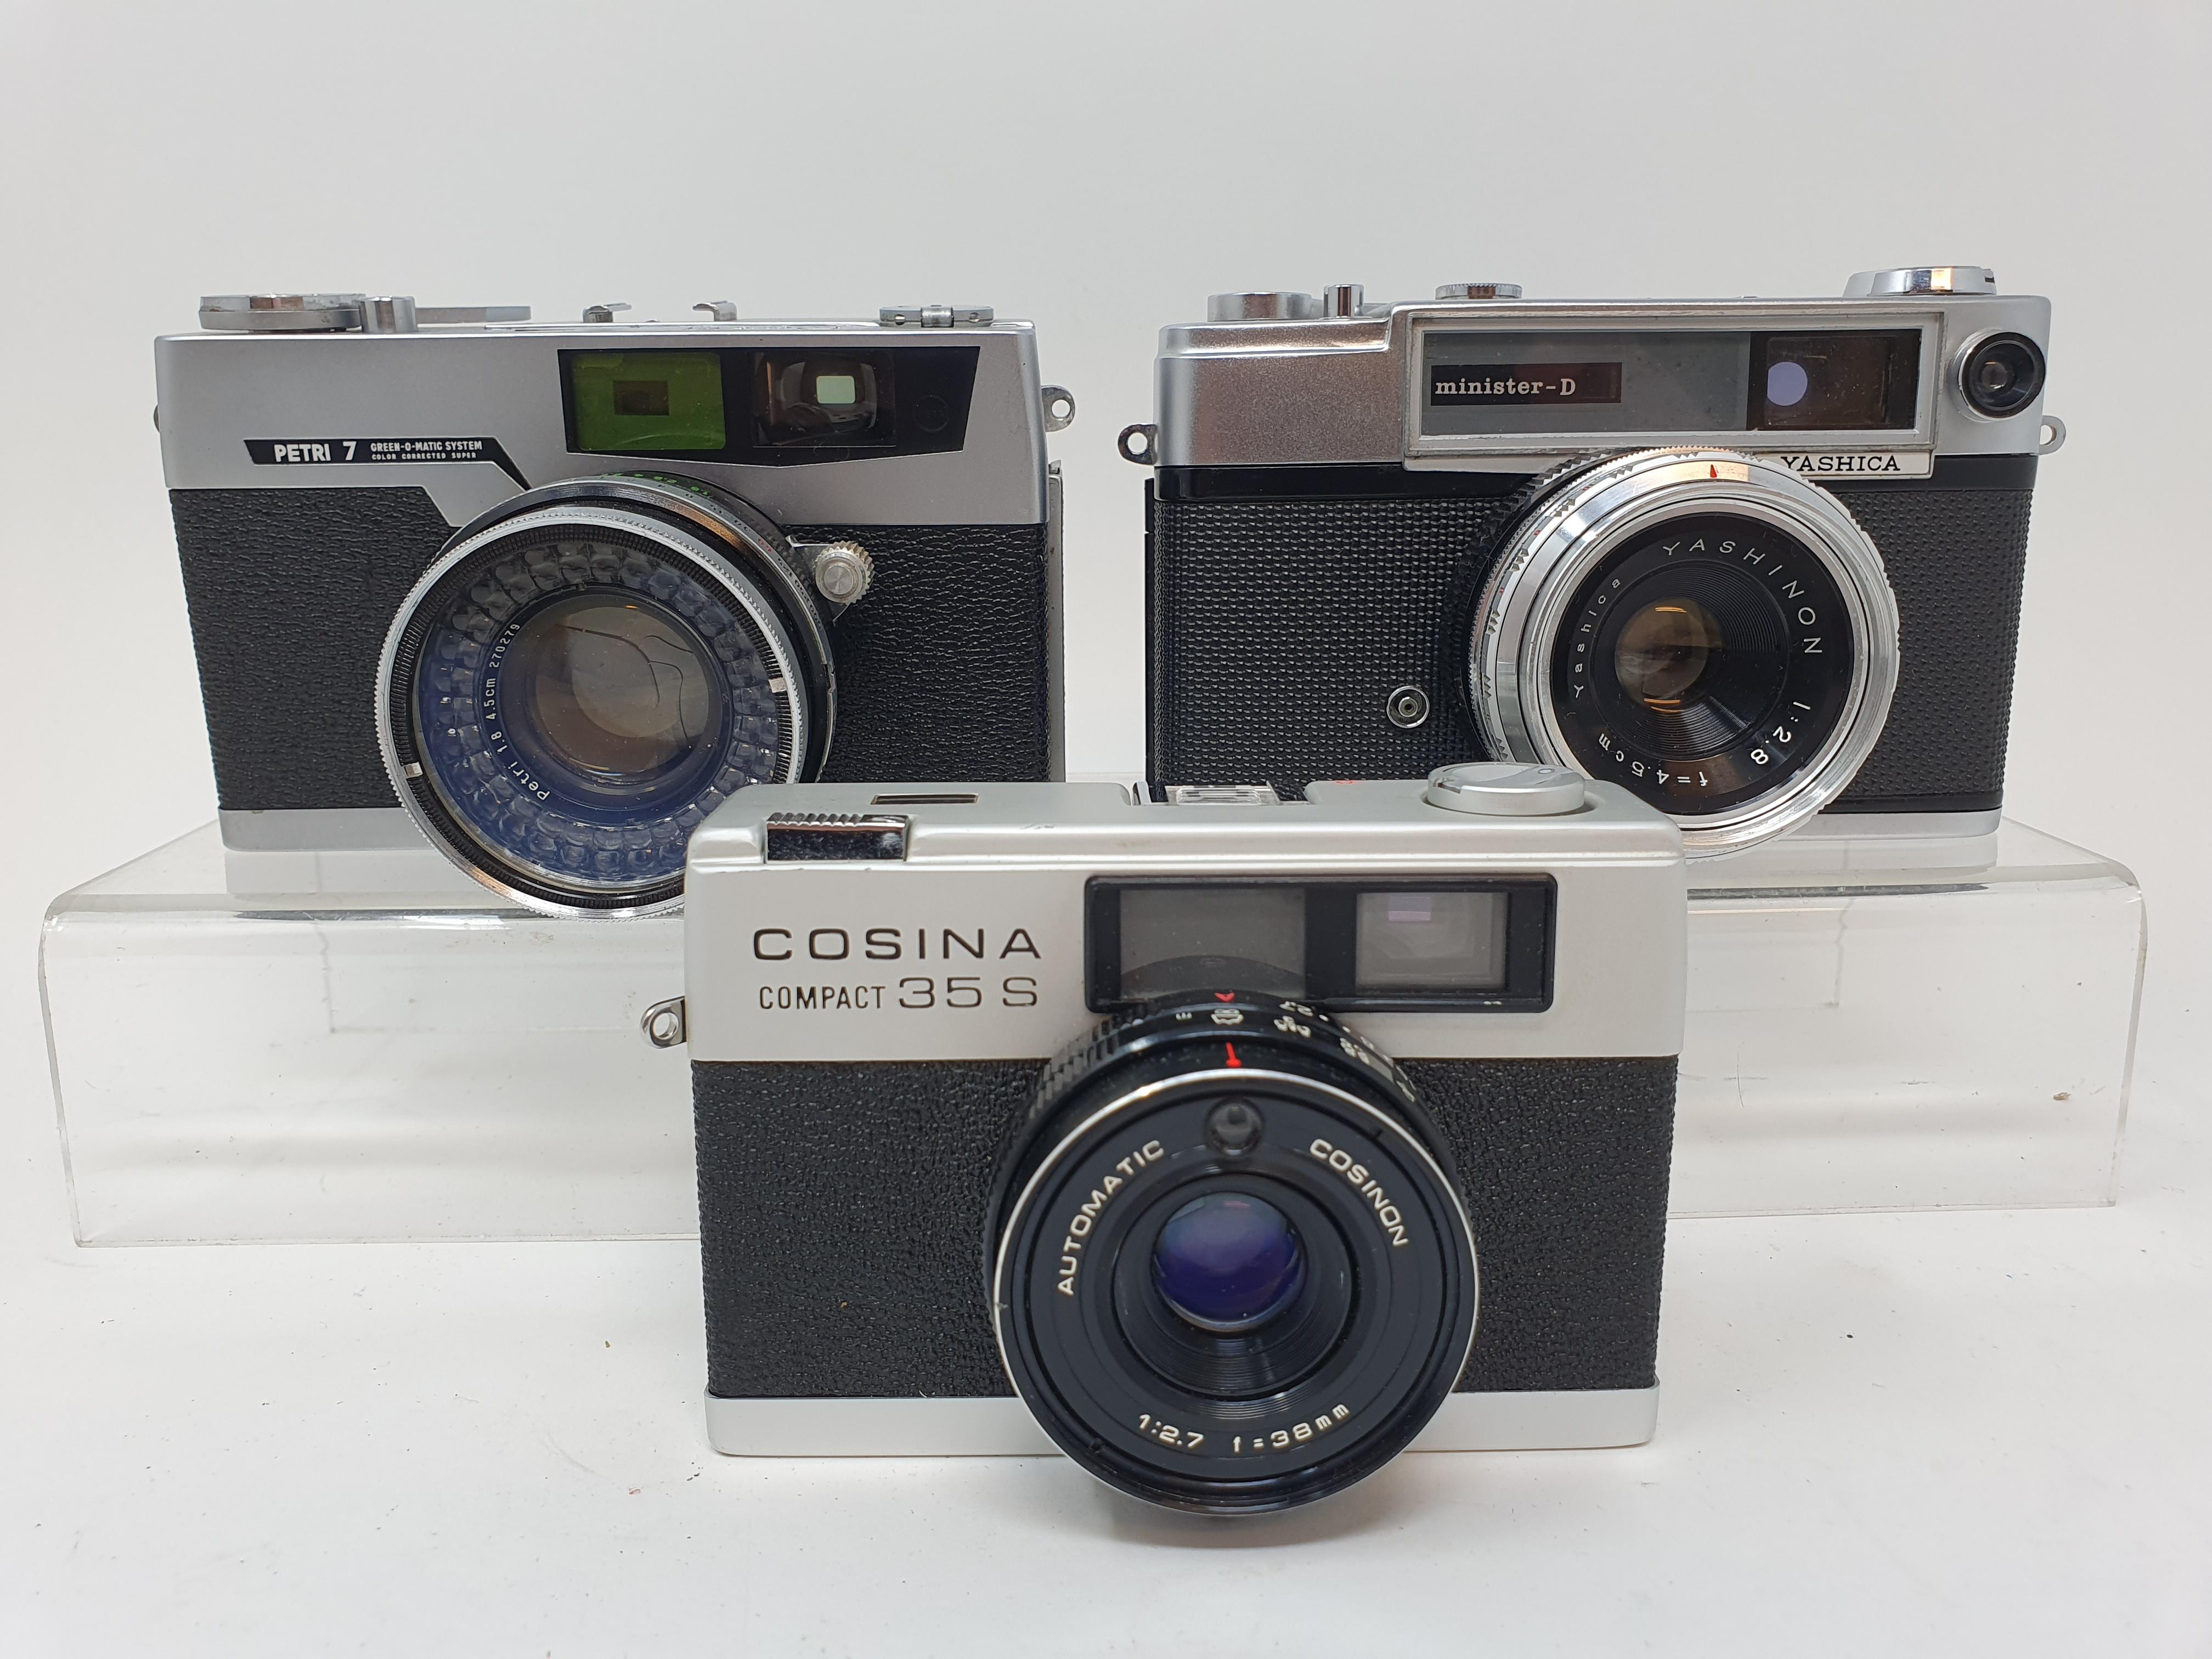 A Cosina compact 35S camera, a Yashica camera, serial number T-737513, and a Pretri 7 camera (3)